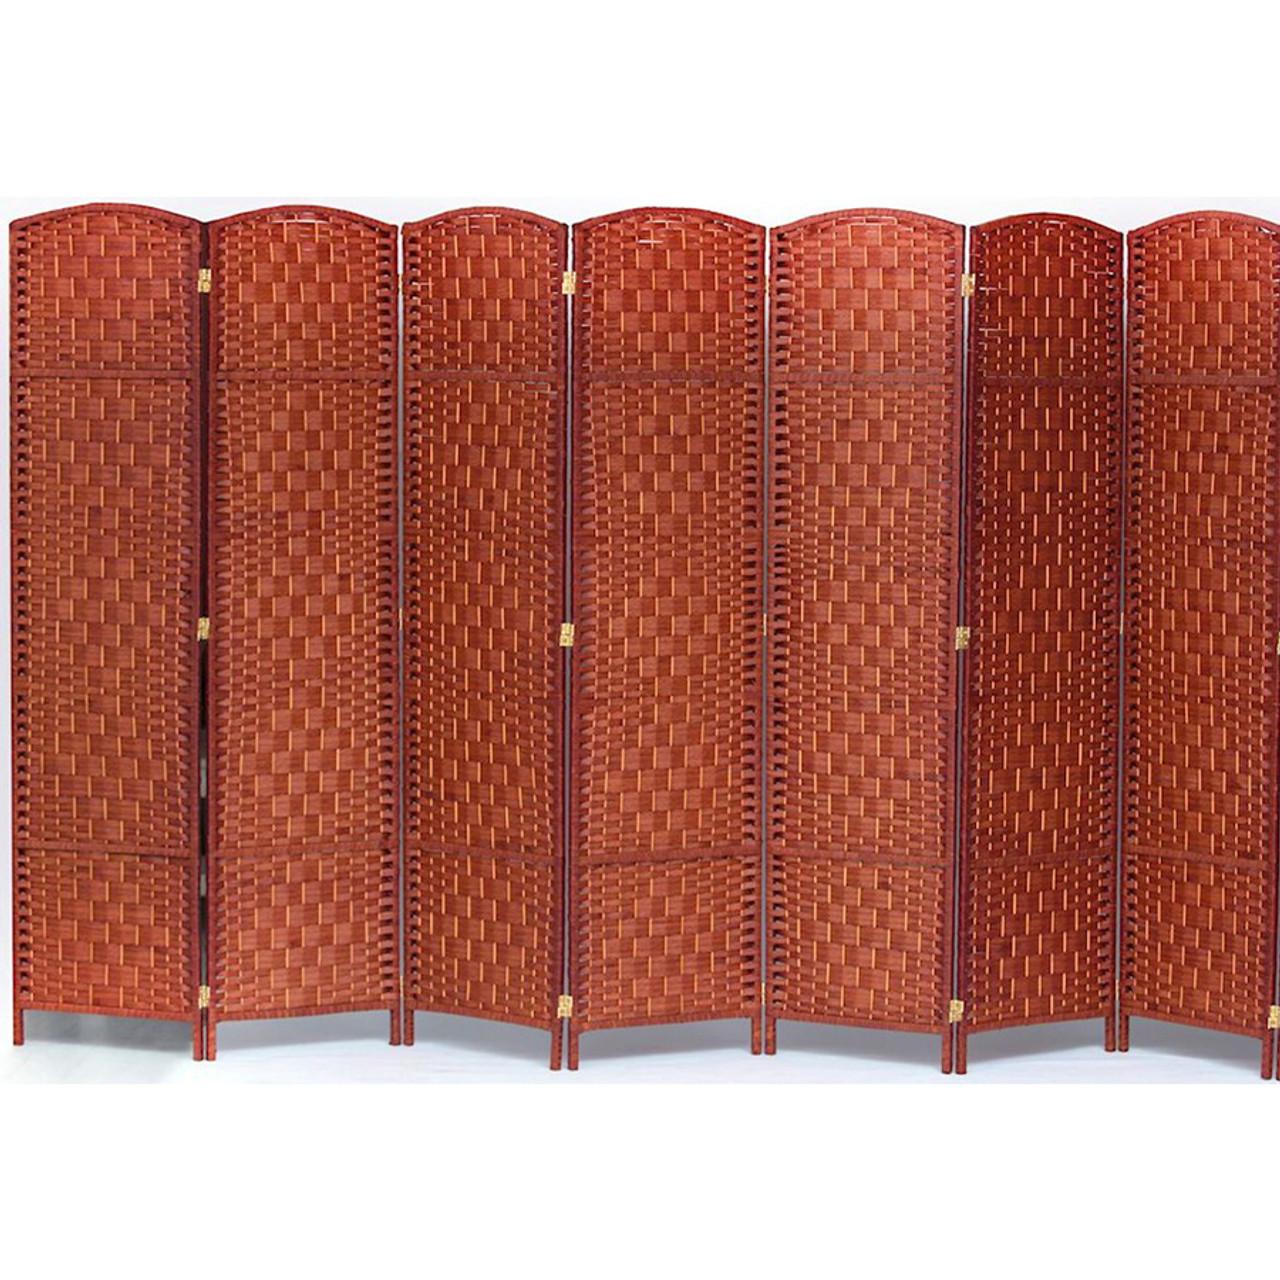 7 Panel Room Divider, Privacy Partition Screen Bamboo Woven Panel in USA, California, New York, NY City, Los Angeles, San Francisco, Pennsylvania, Washington DC, Virginia, Maryland